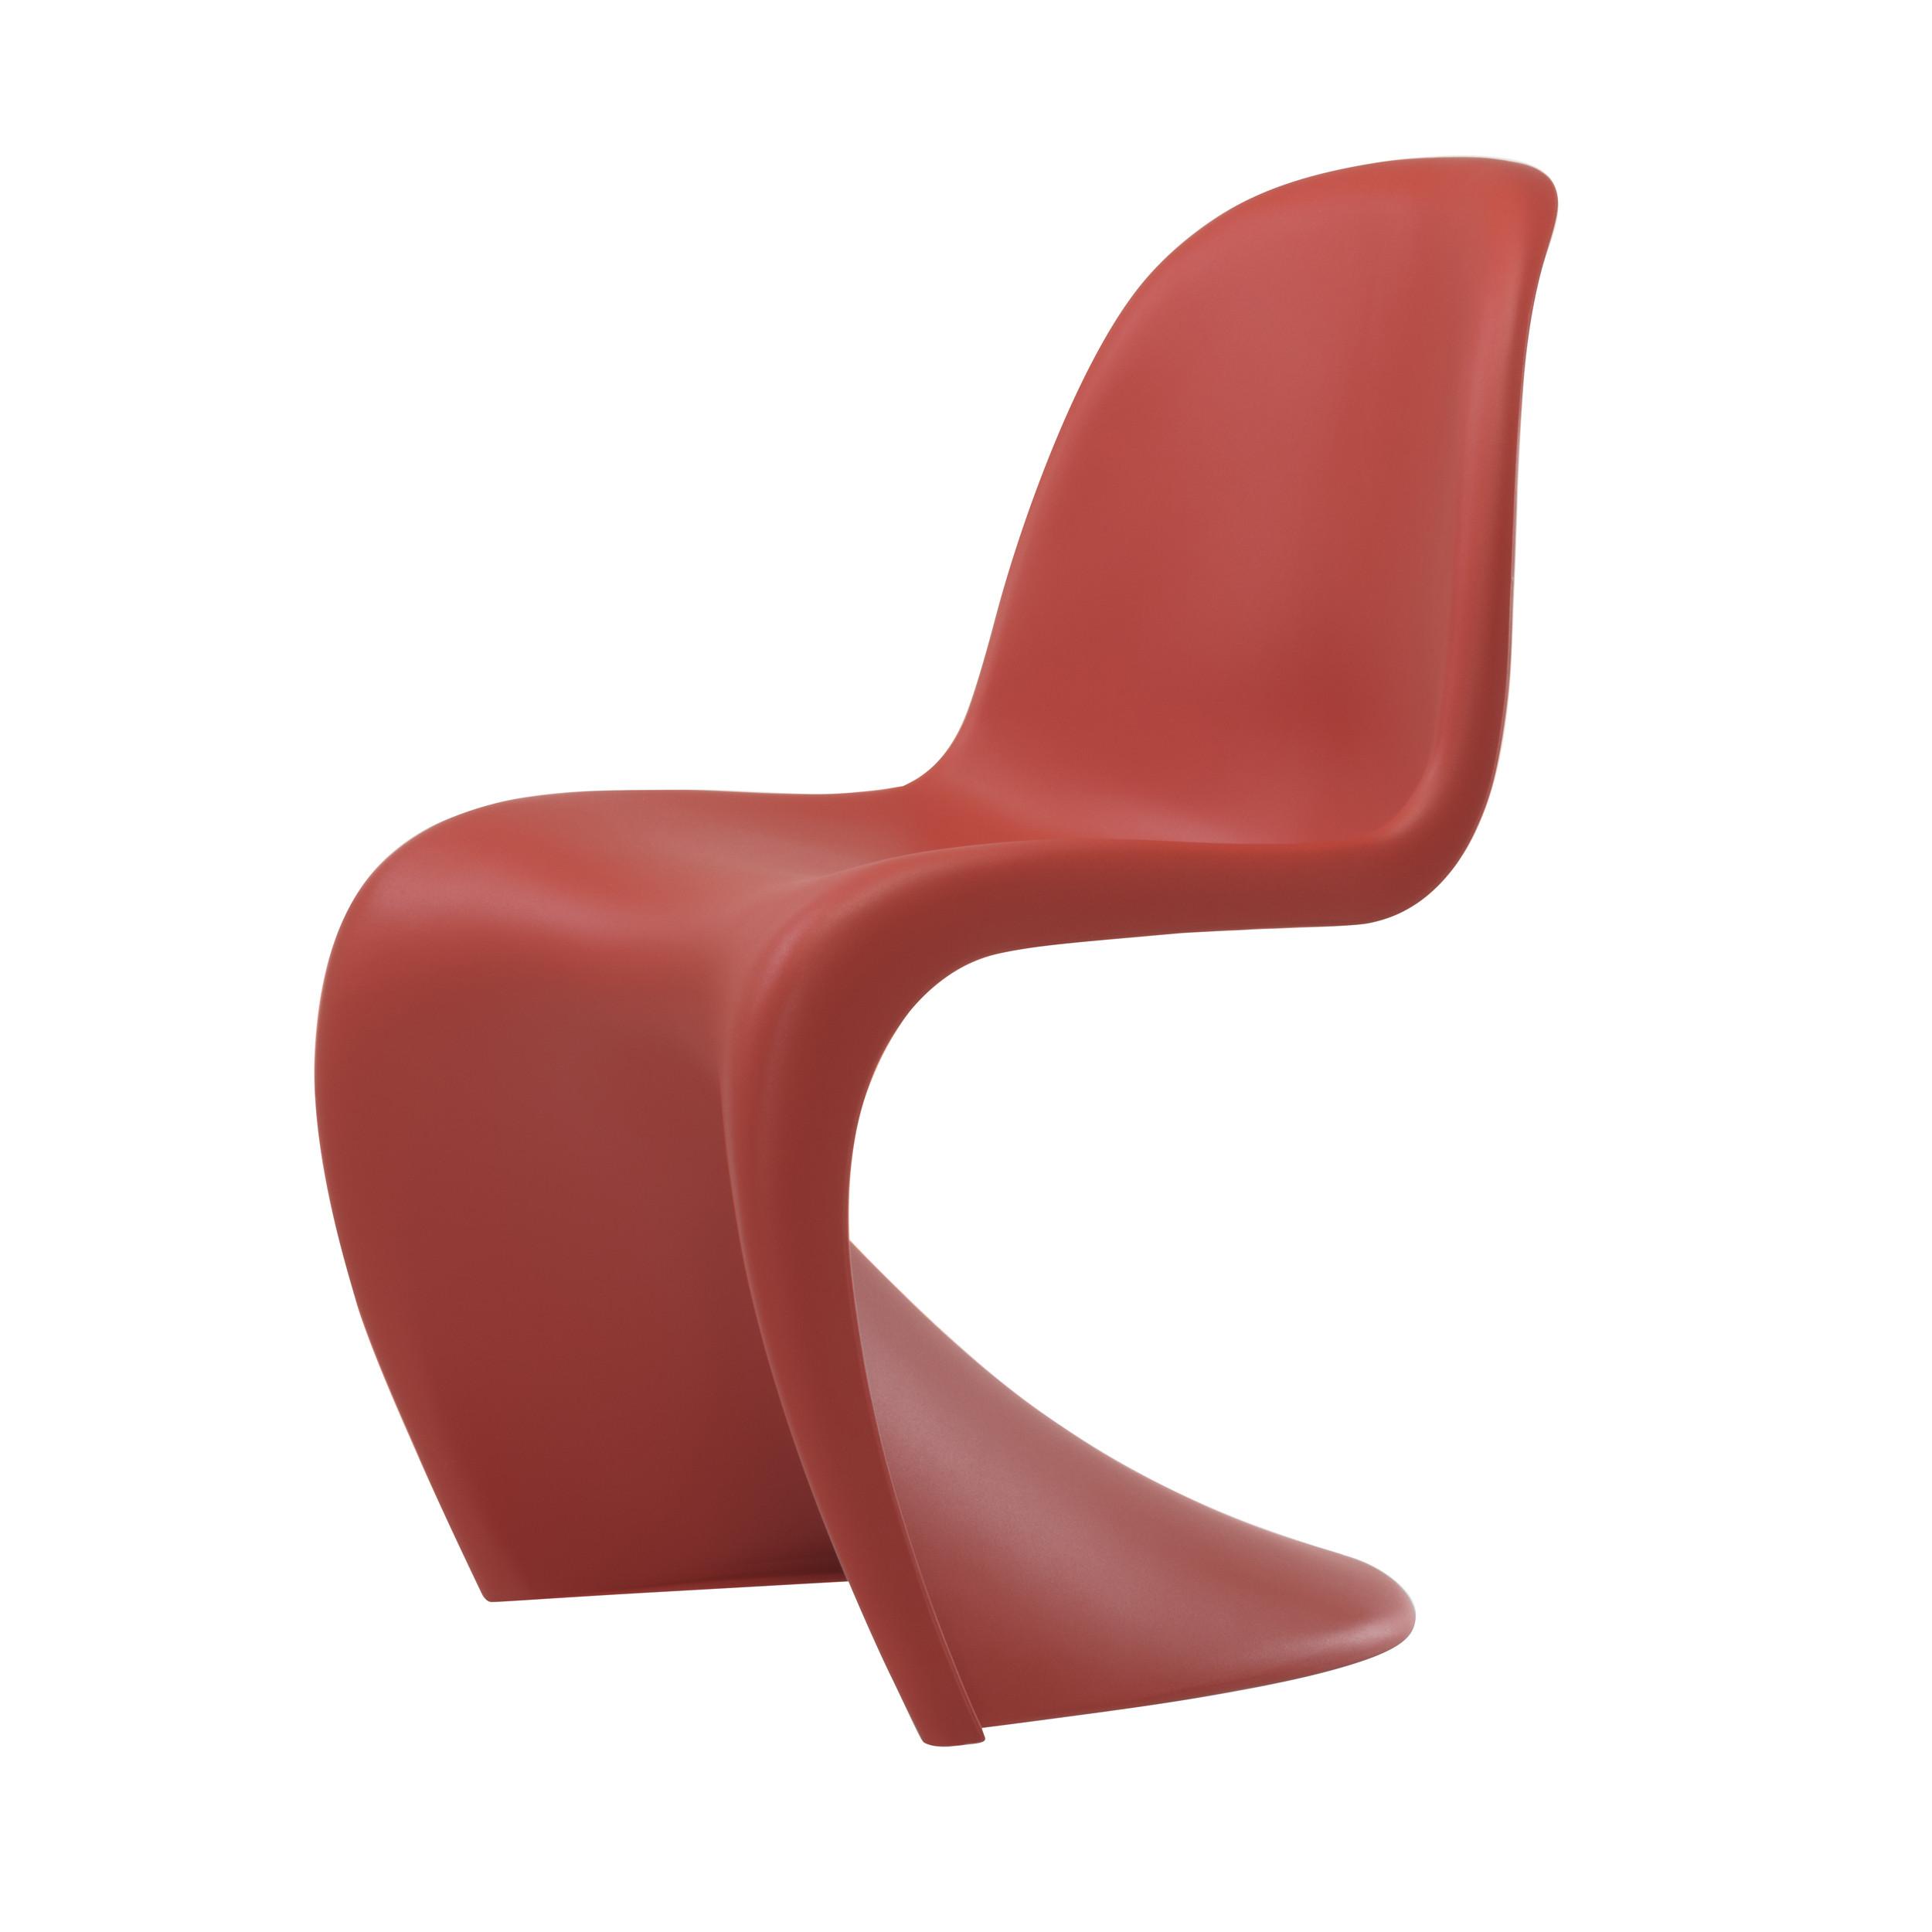 Panton chair stuhl online kaufen bei woonio for Panton stuhl replik